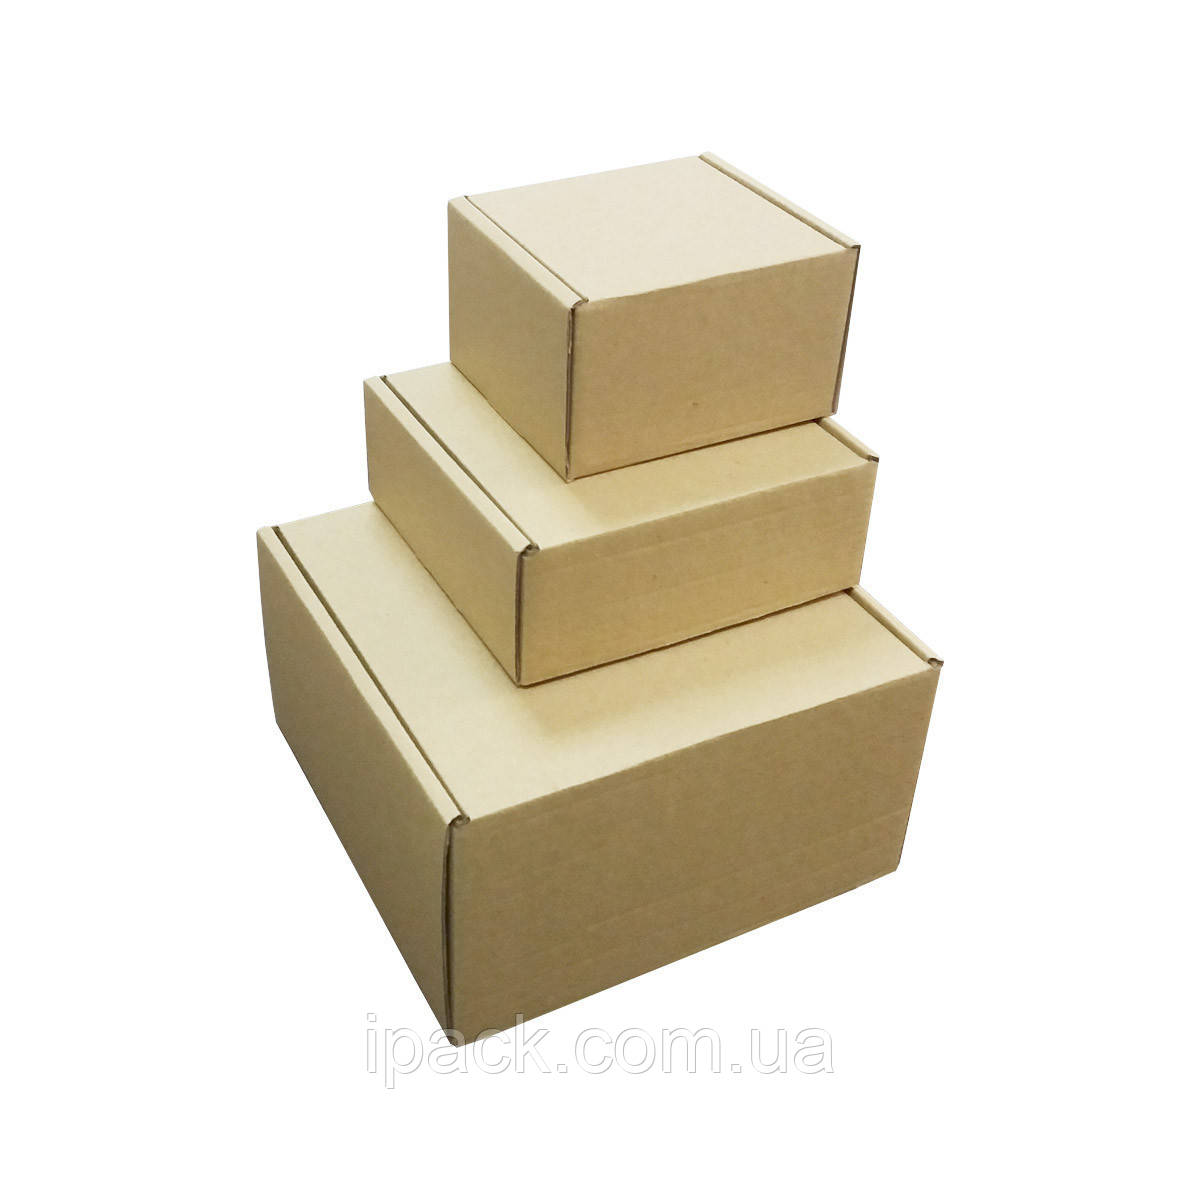 Коробка картонная самосборная, 250*65*55, мм, бурая, крафт, микрогофрокартон